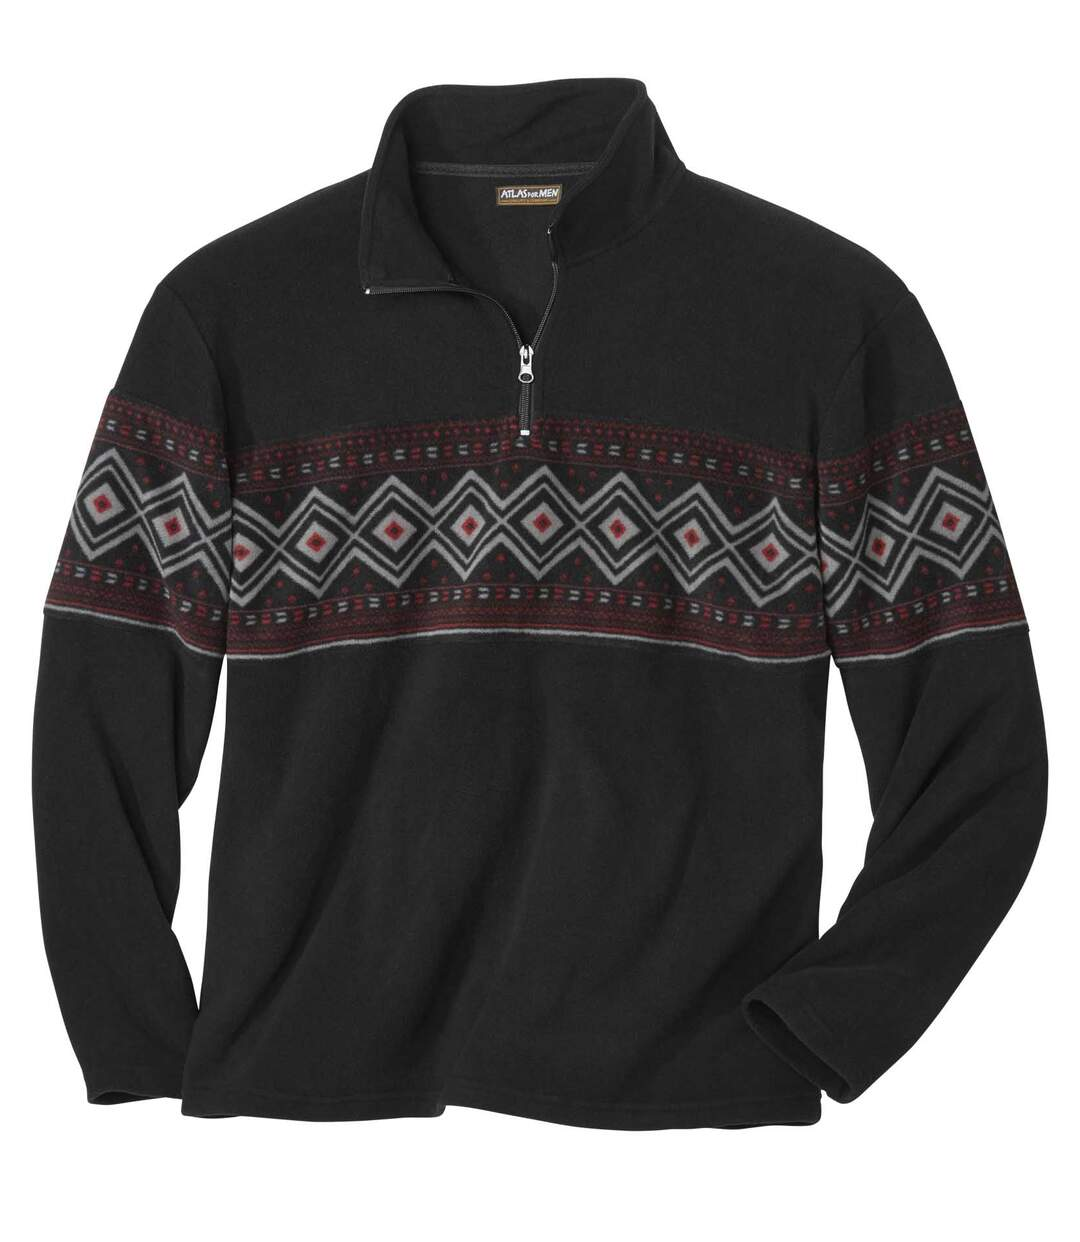 Fleece-Sweatshirt mit Jacquard-Muster